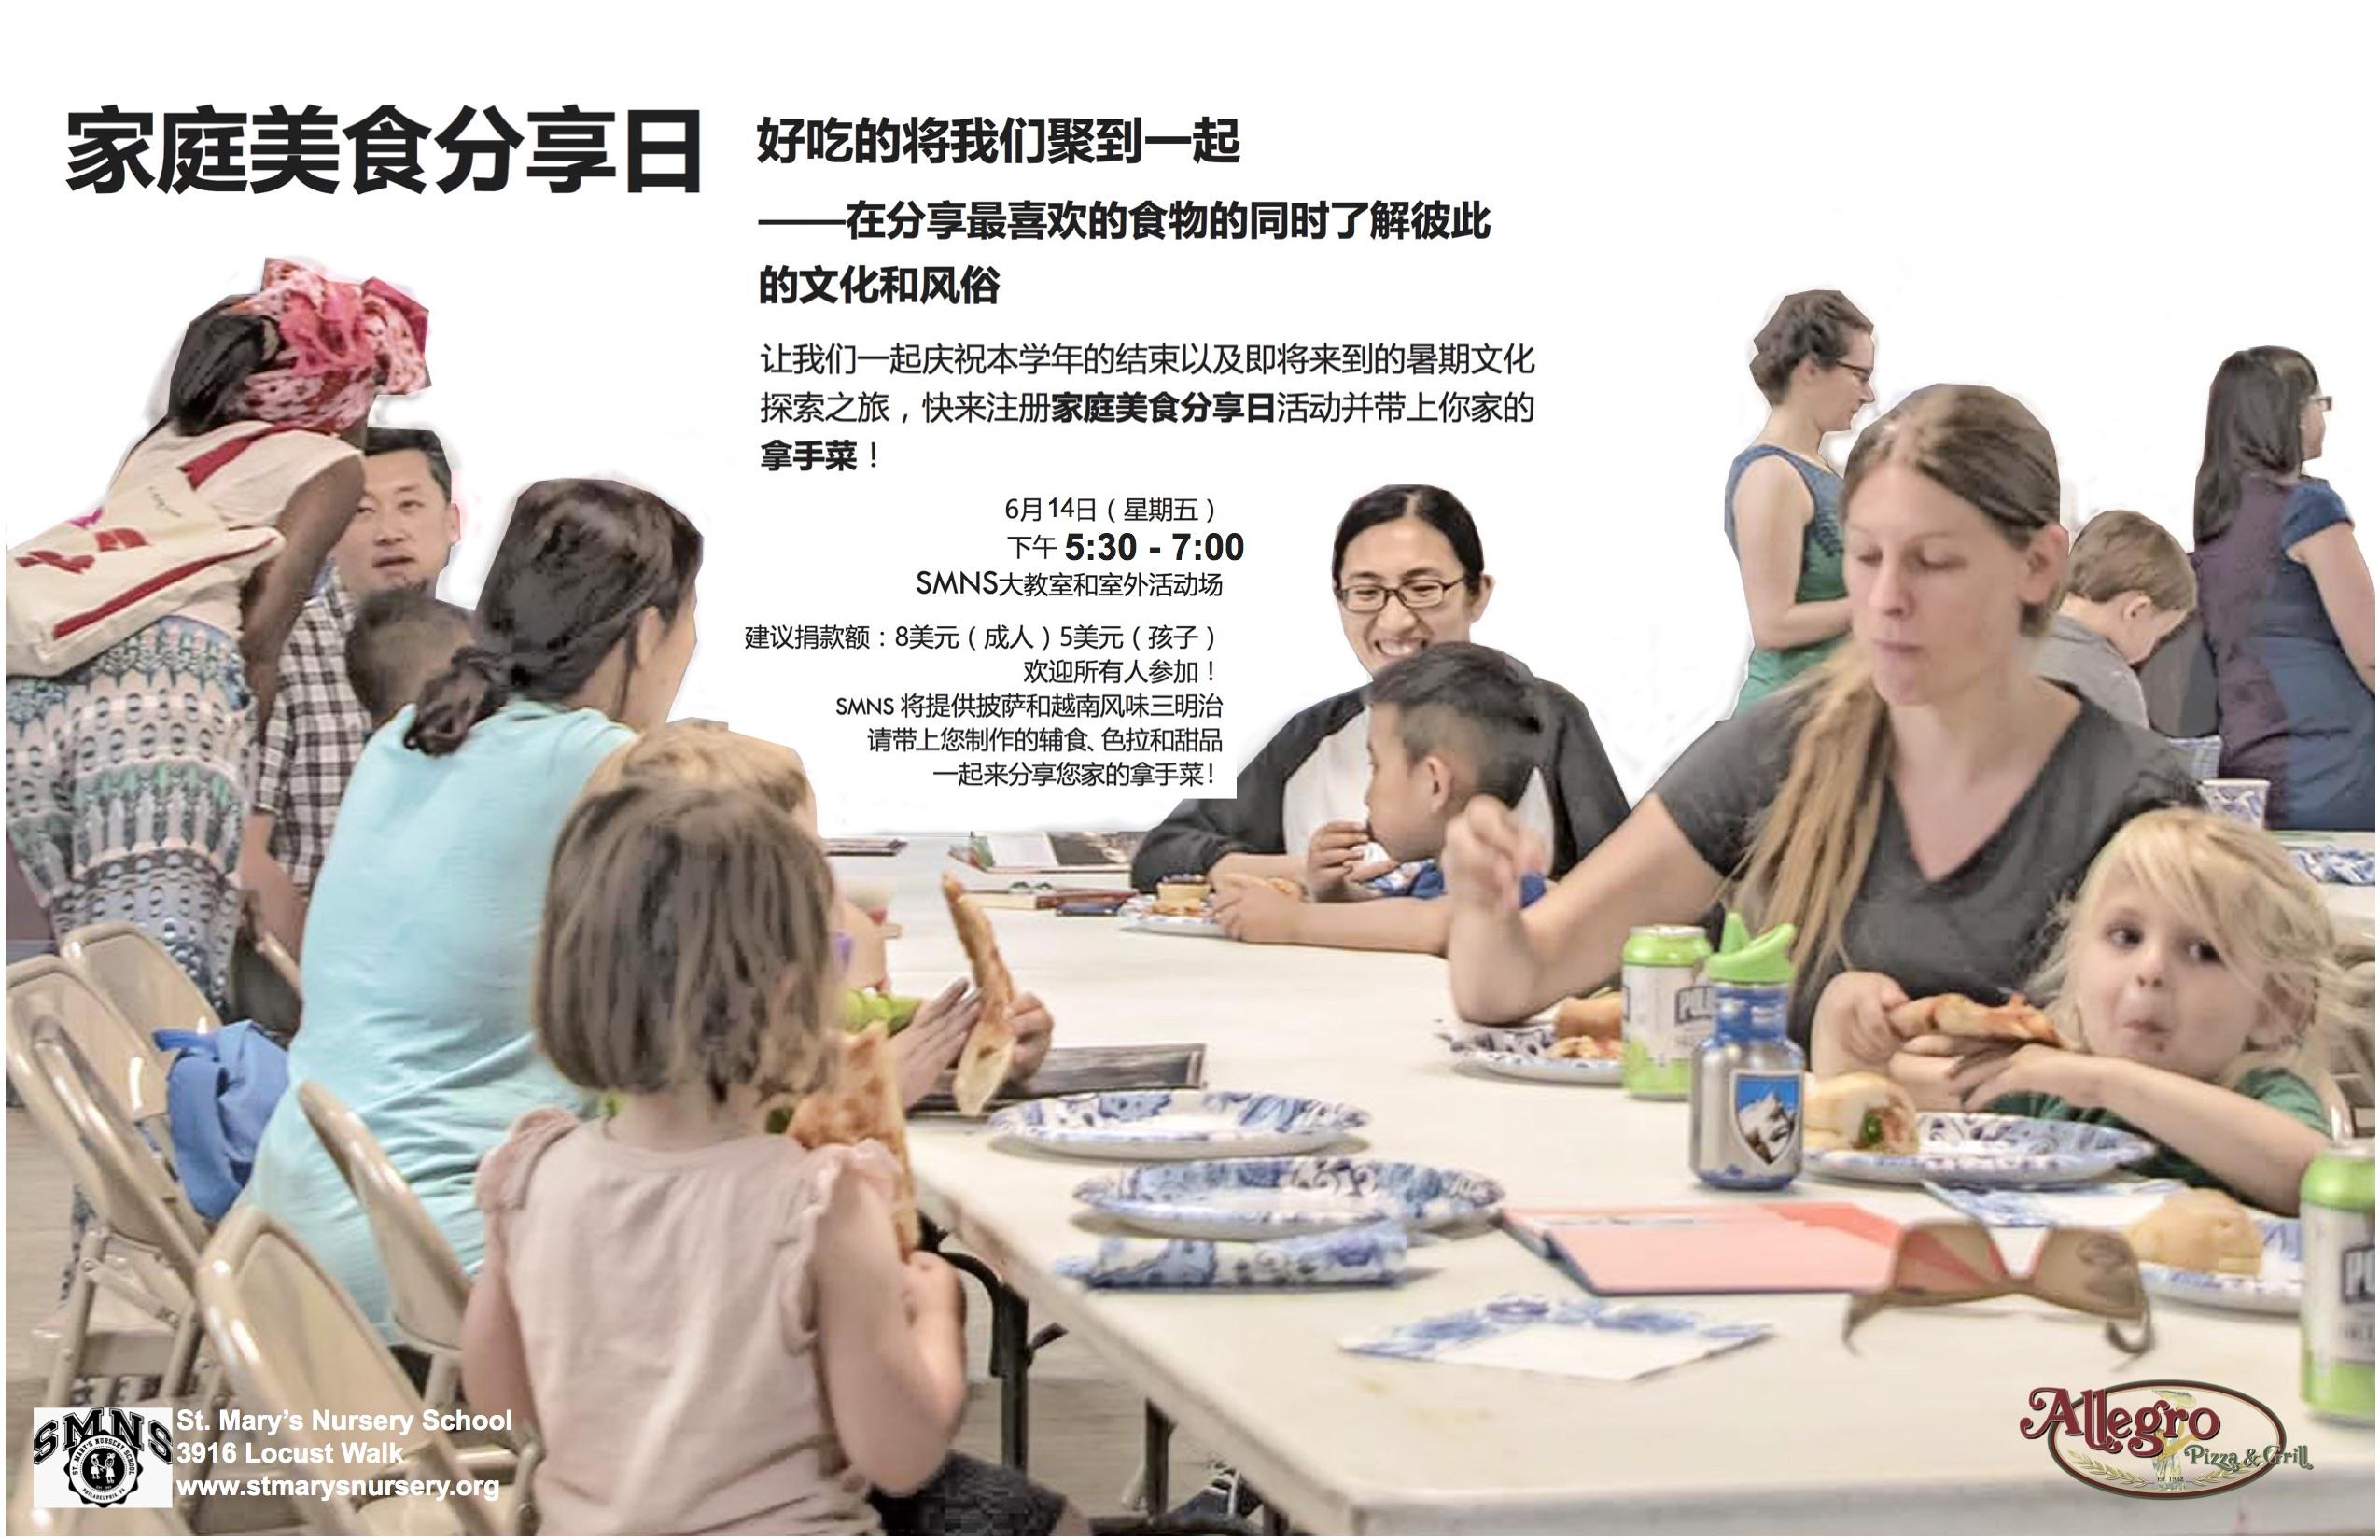 Chinese language flyer